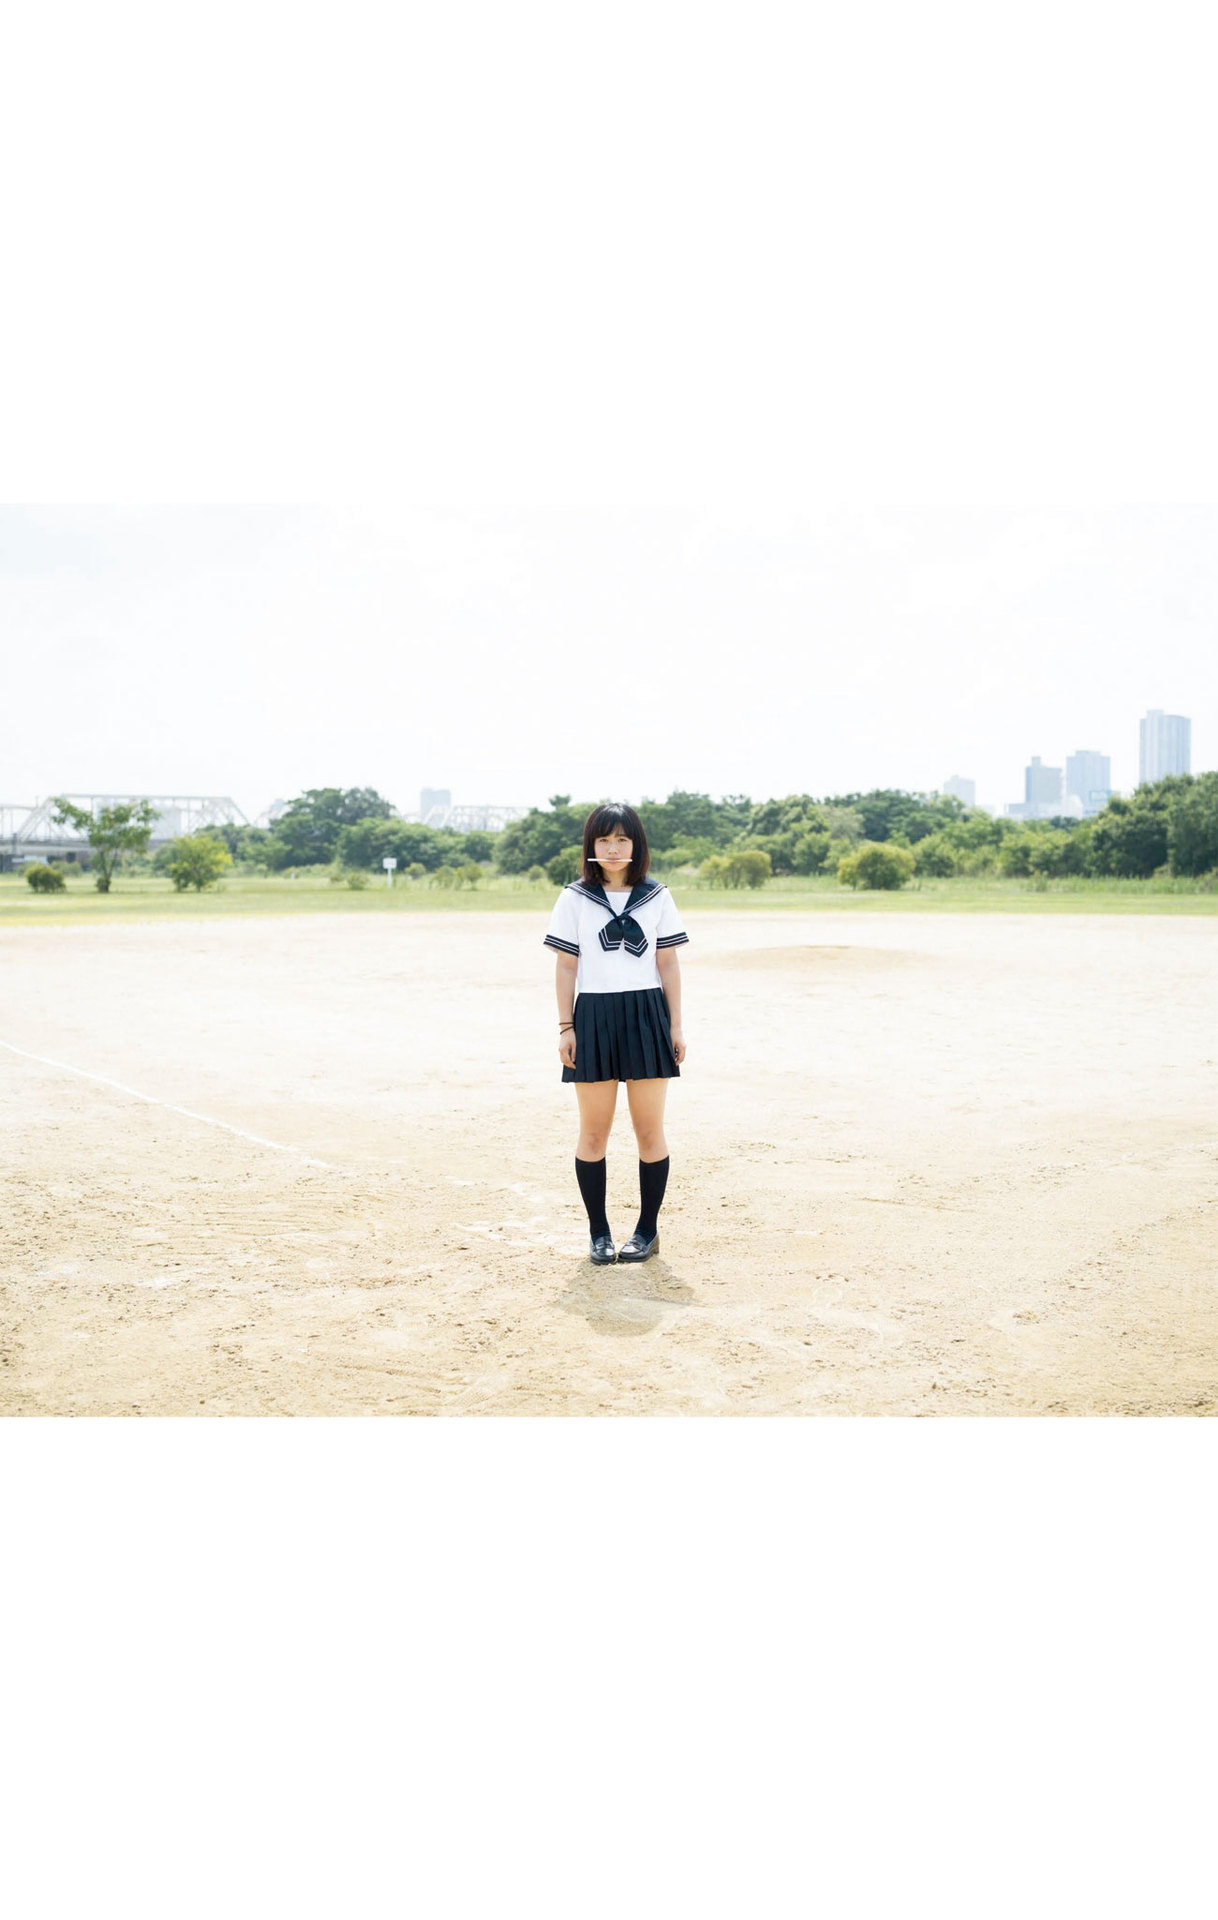 Summer Vacation Uniform After School Youth Bikini039